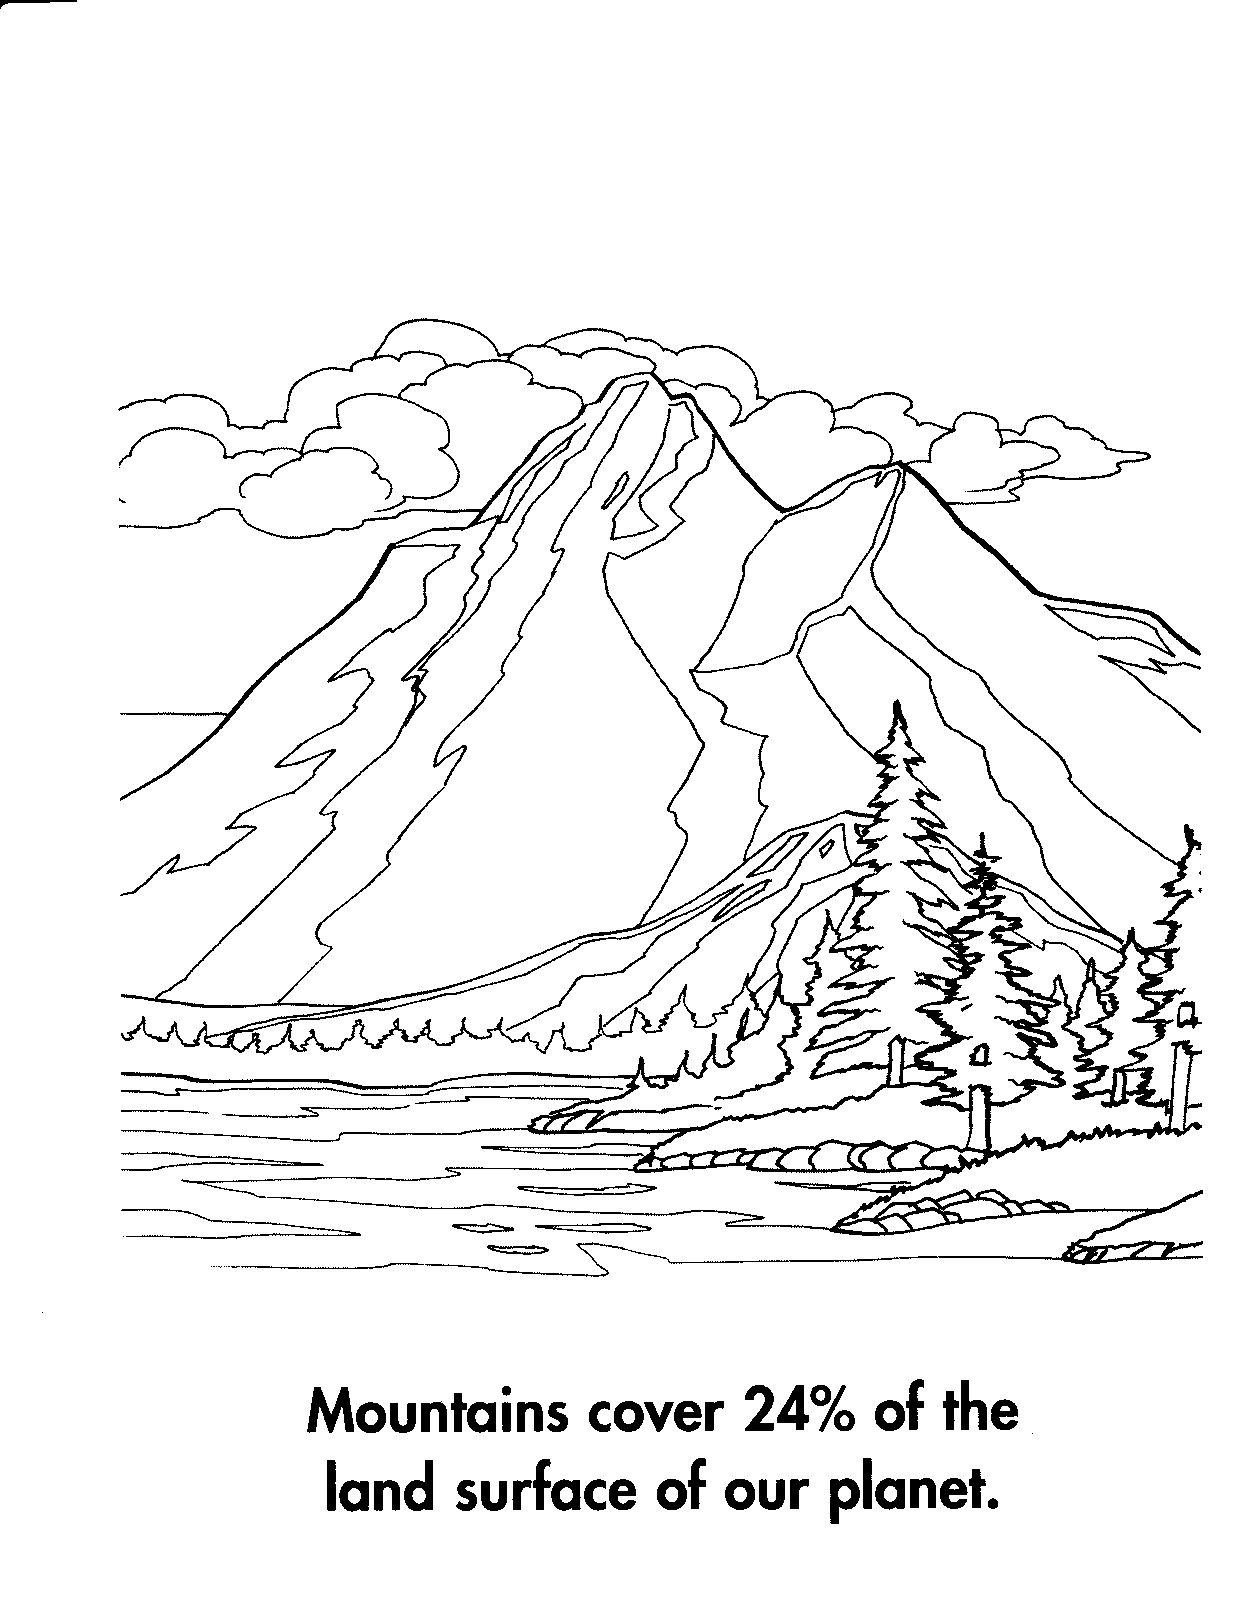 Coloring Book Coloring Habitat Mountains Coloring Pages Nature Coloring Pages Winter Coloring Pages